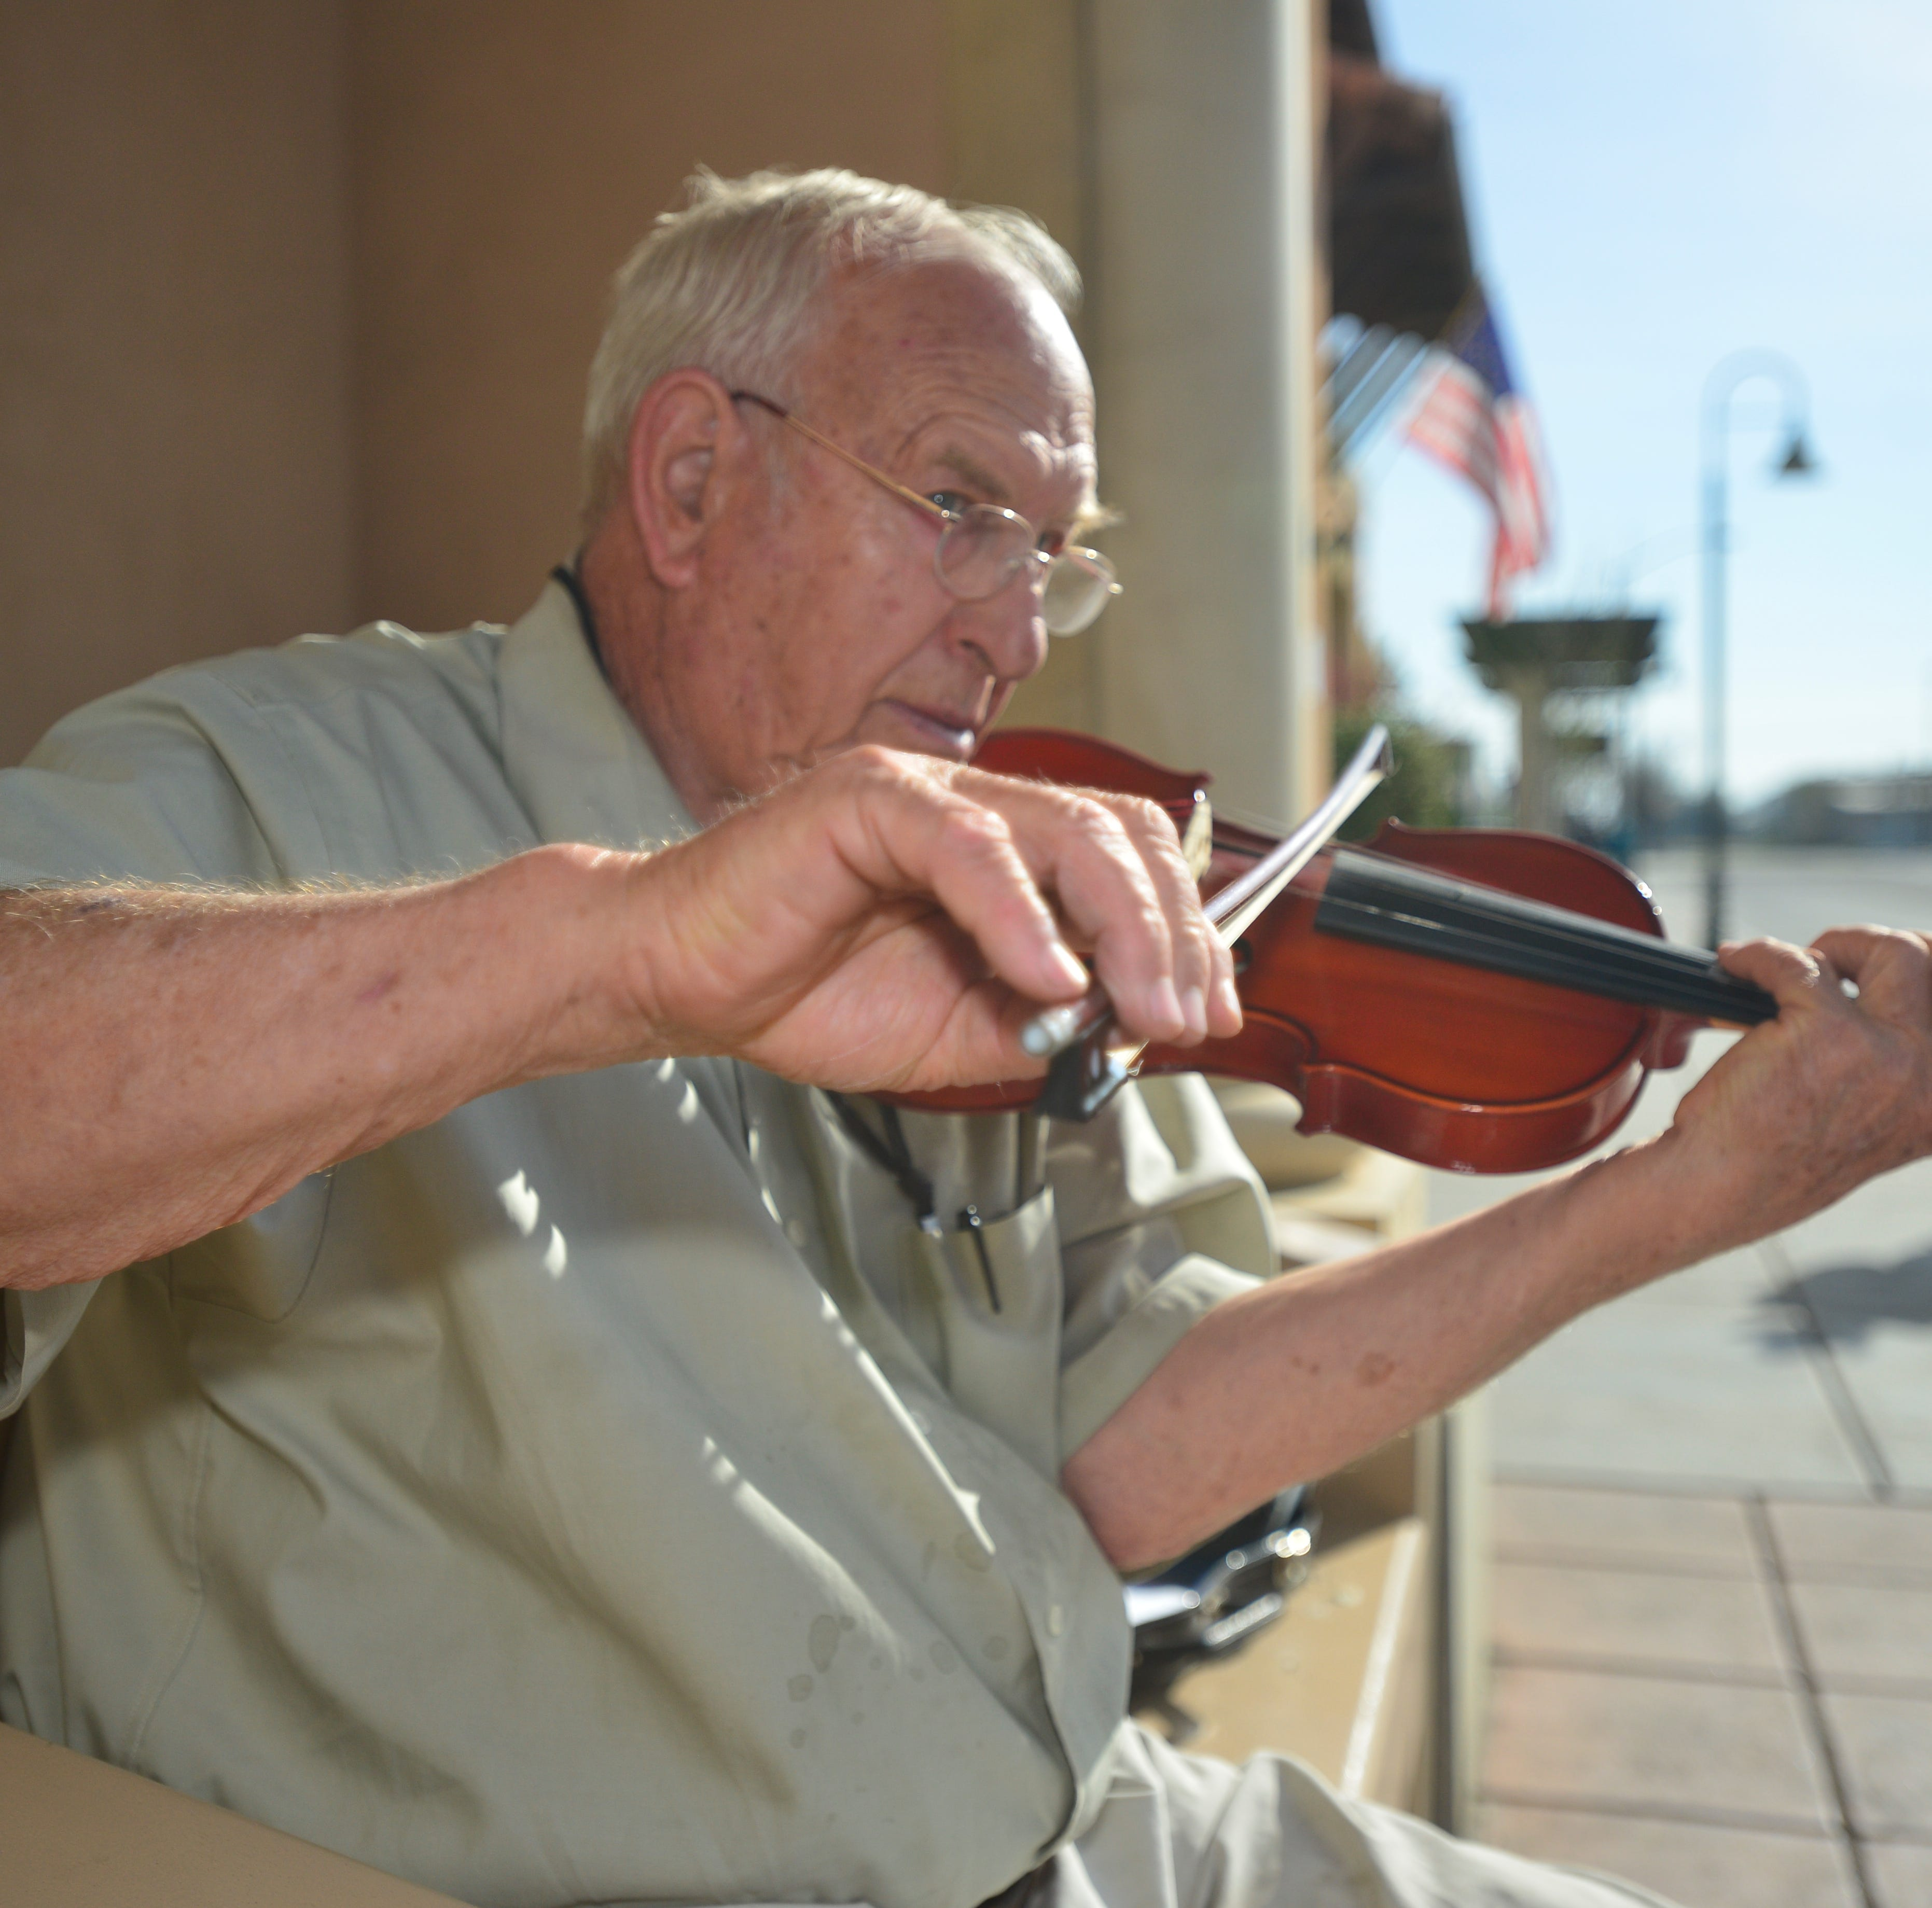 Downtown Visalia's self-taught violinist dies